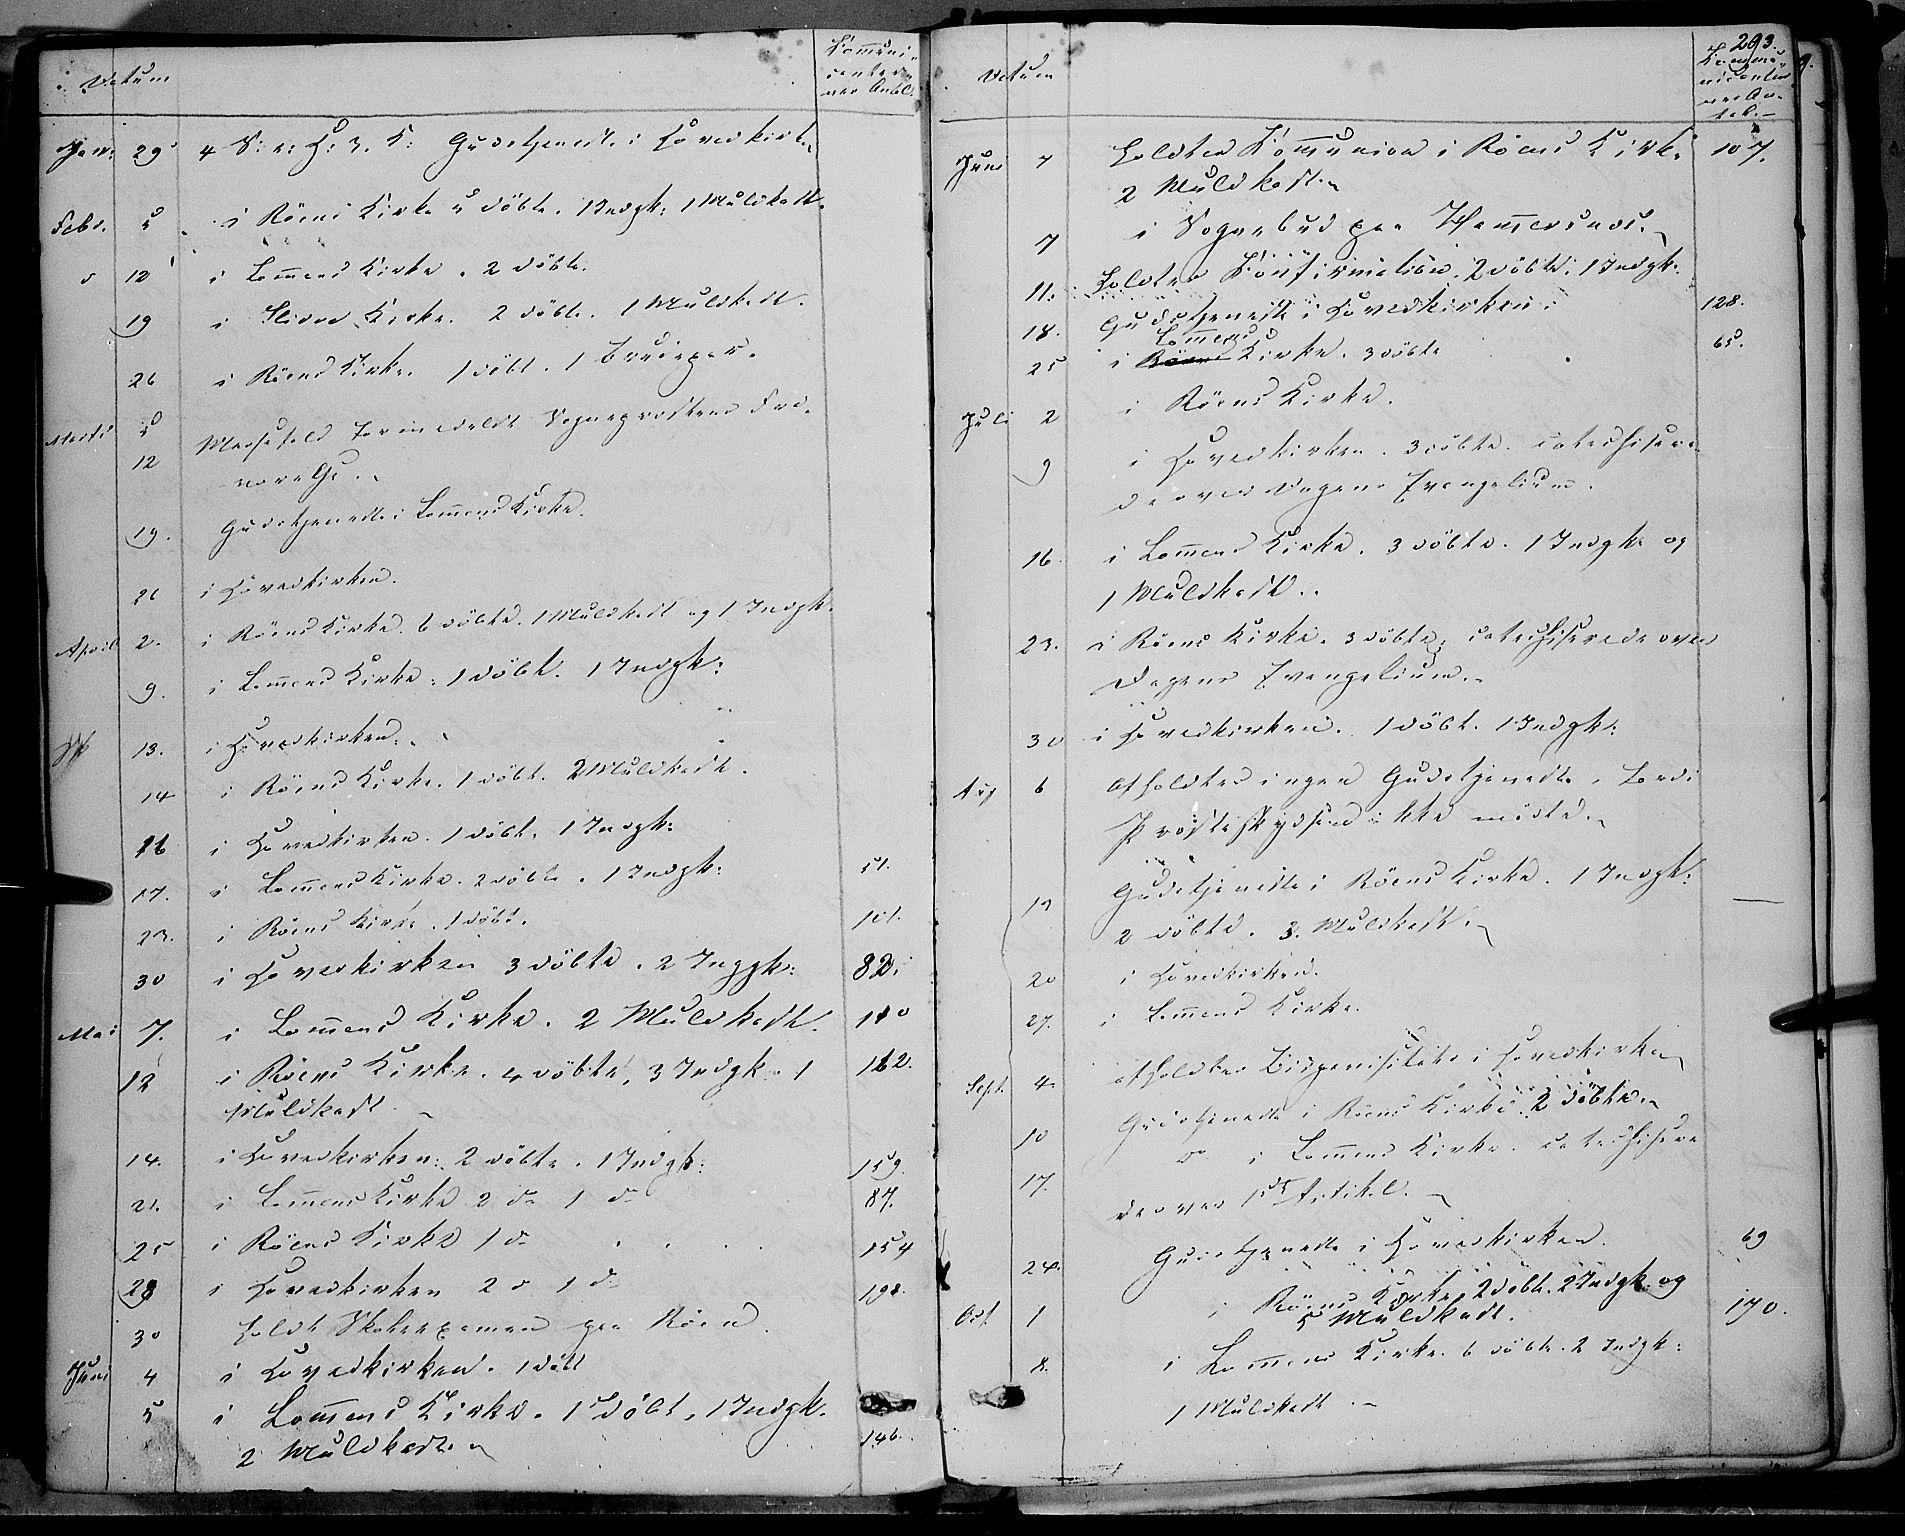 SAH, Vestre Slidre prestekontor, Ministerialbok nr. 1, 1844-1855, s. 293